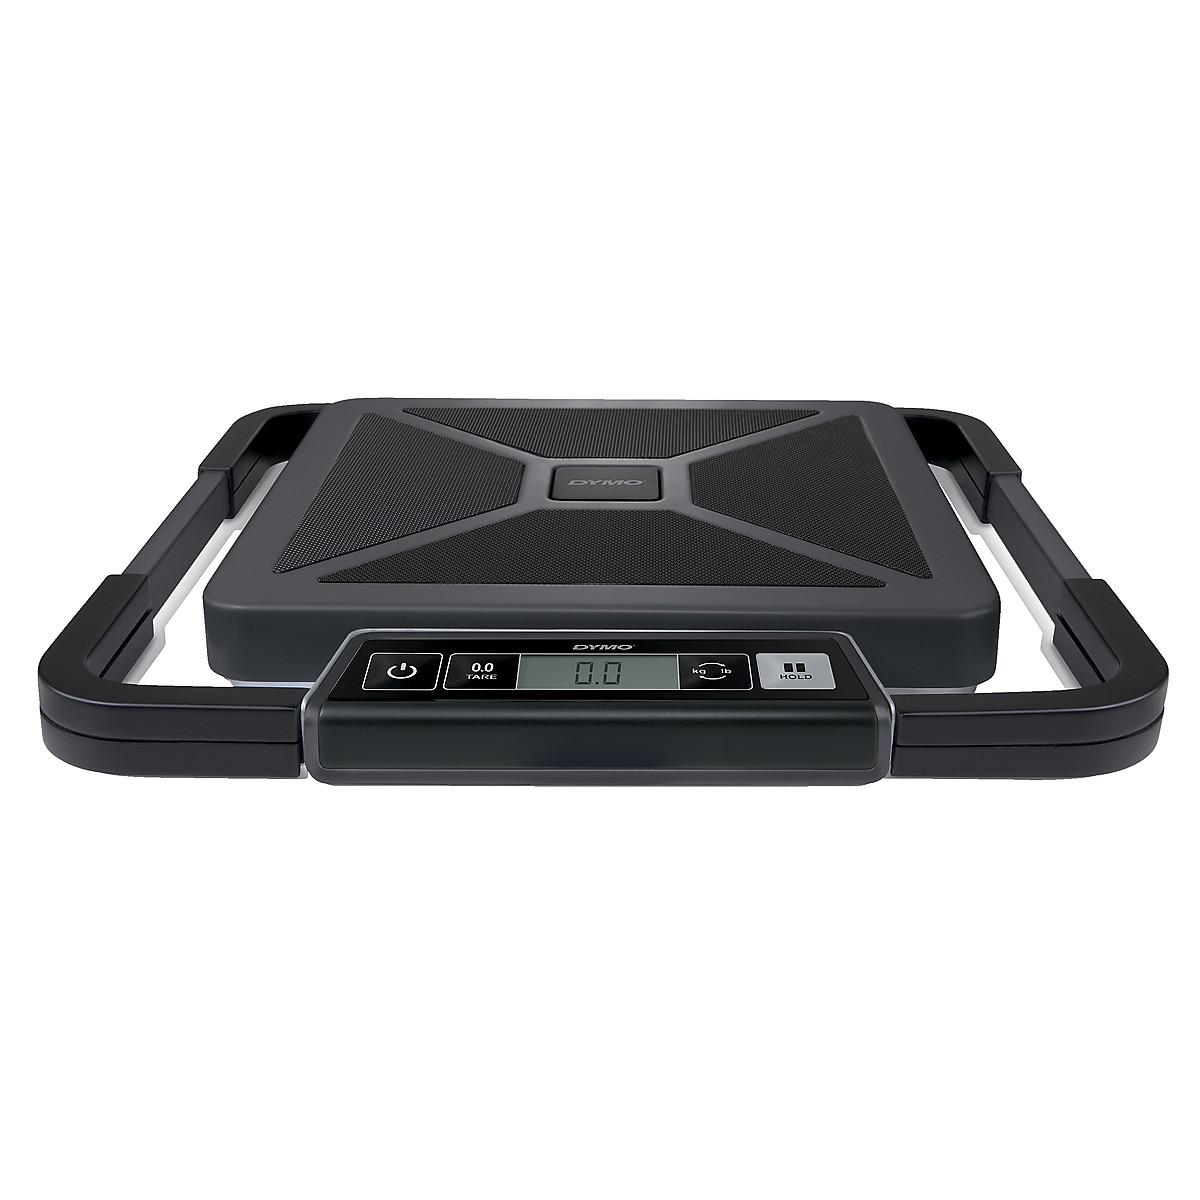 DYMO S50 Parcel Scale